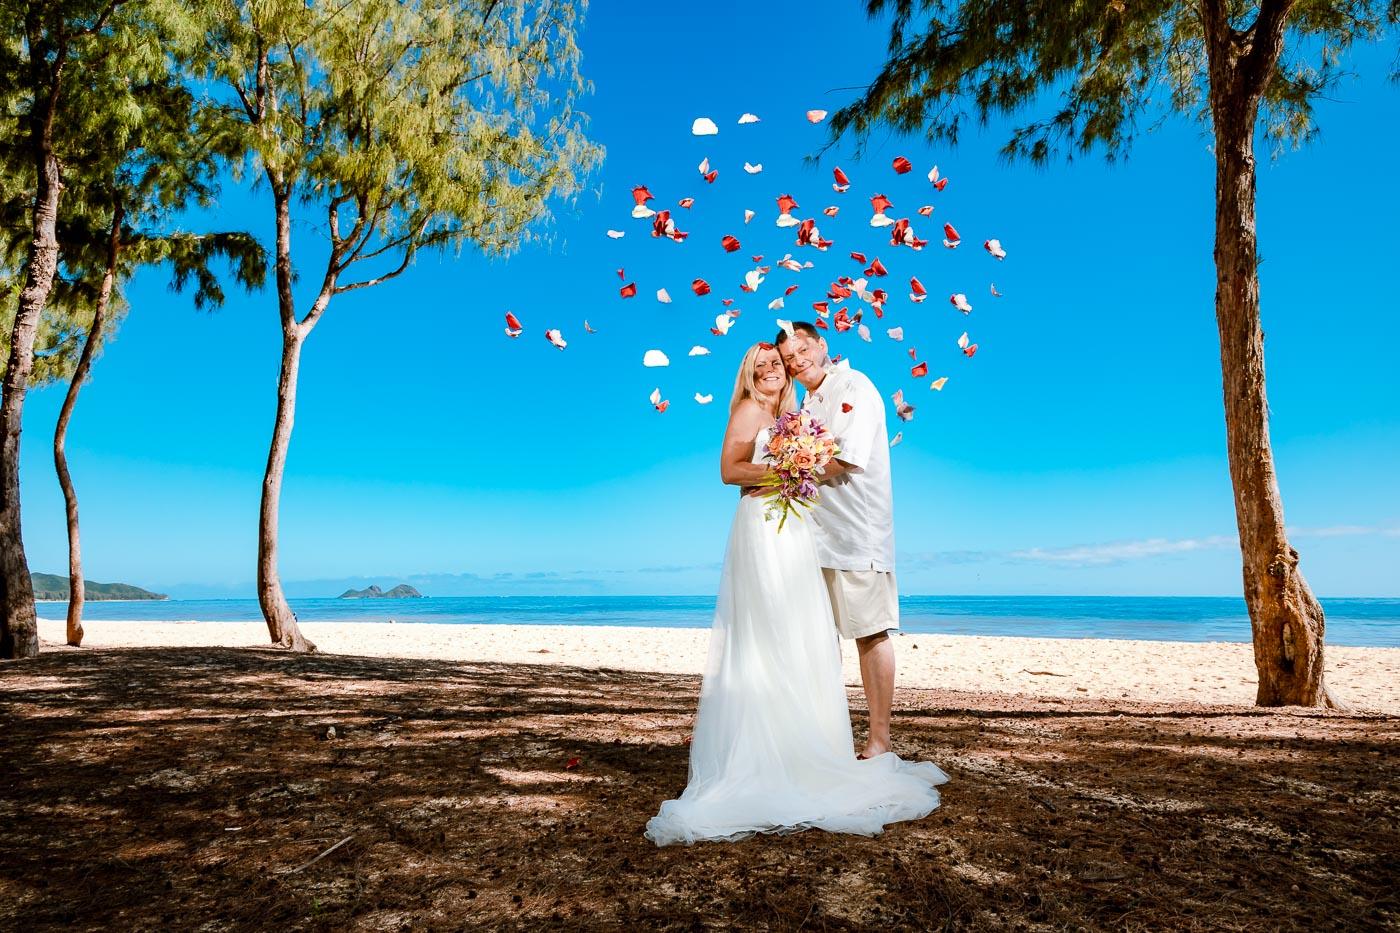 bride and groom wedding portrait oahu beach flower petals